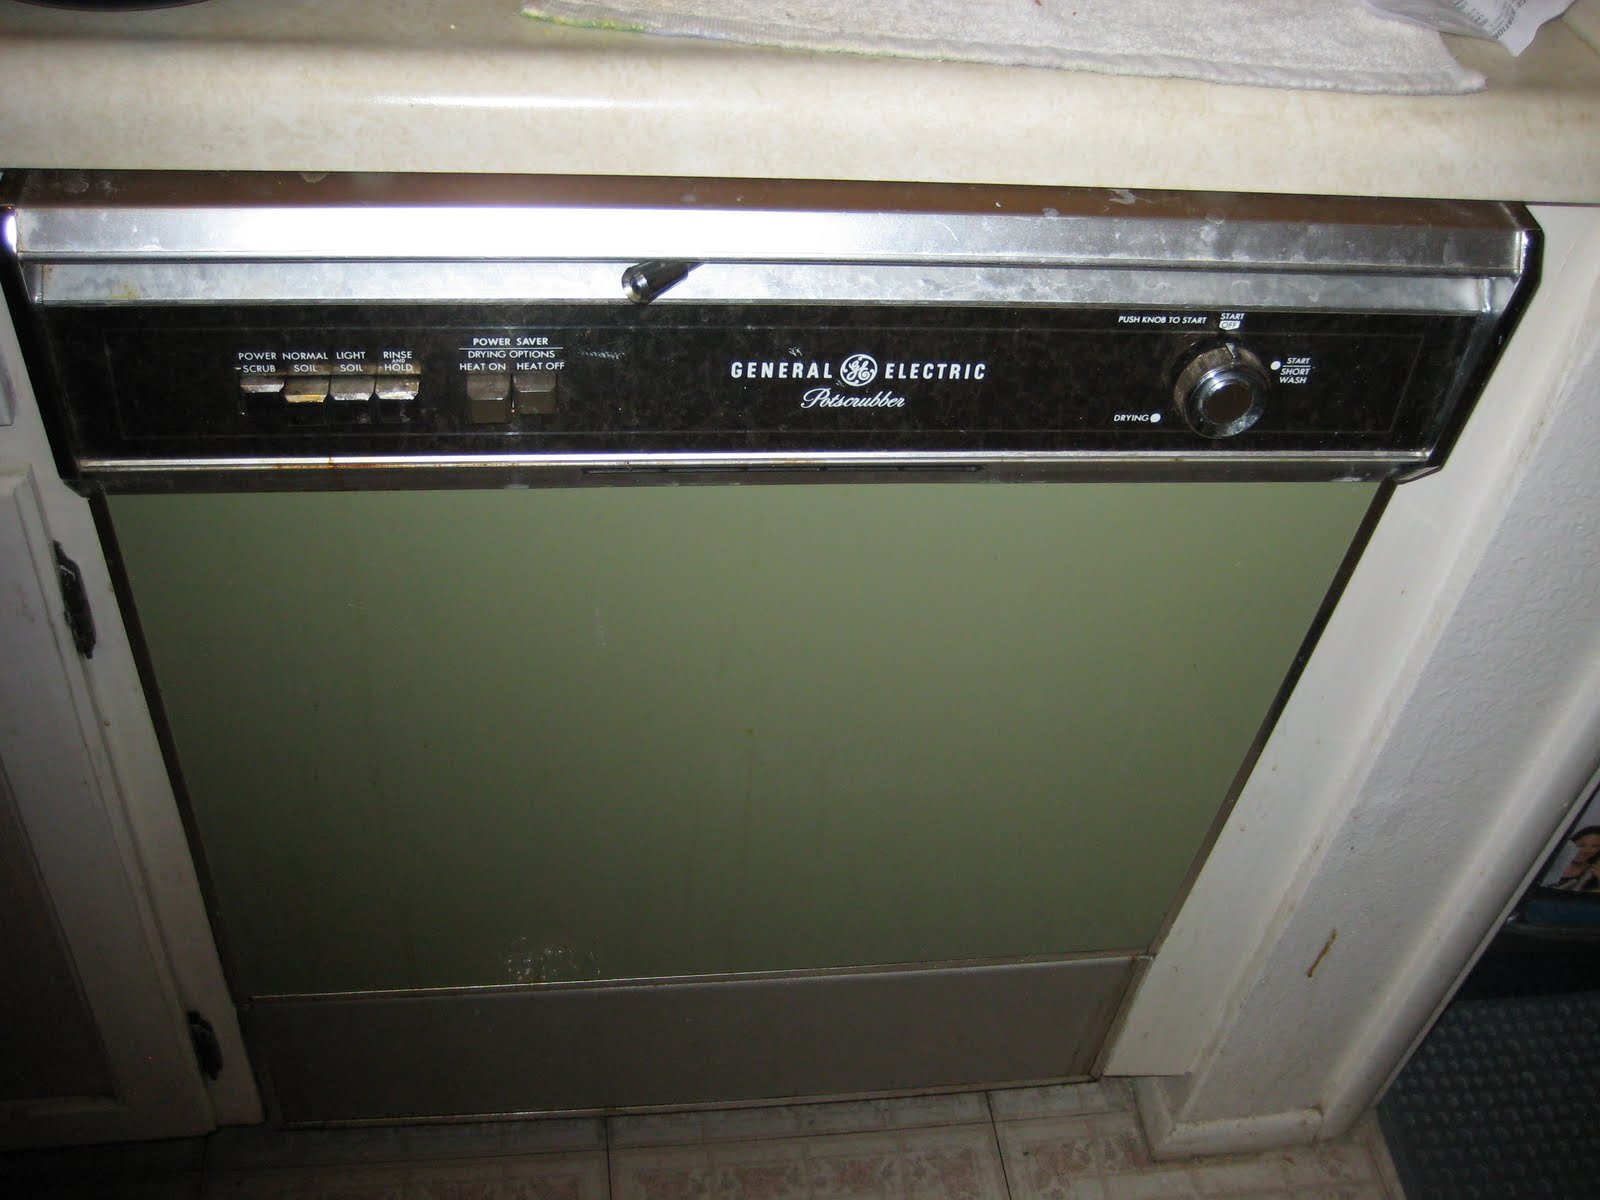 Samsung Electric Dryer Wiring Diagram Trailer 7 Pin Plug Hotpoint Refrigerator